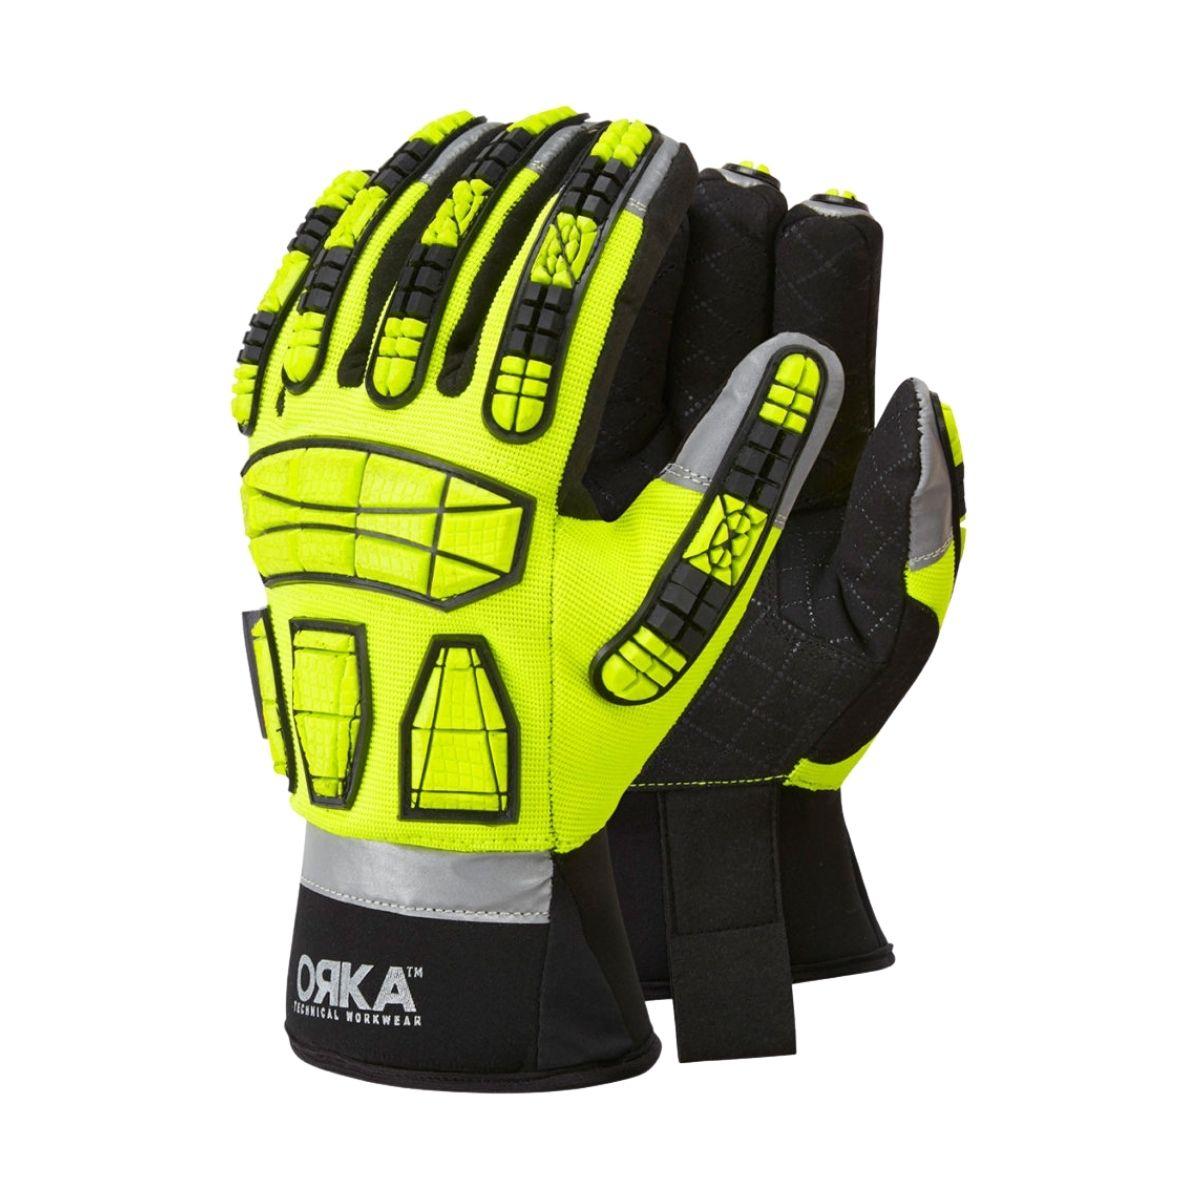 GL1901 ORKA Oil Impact Waterproof Gloves